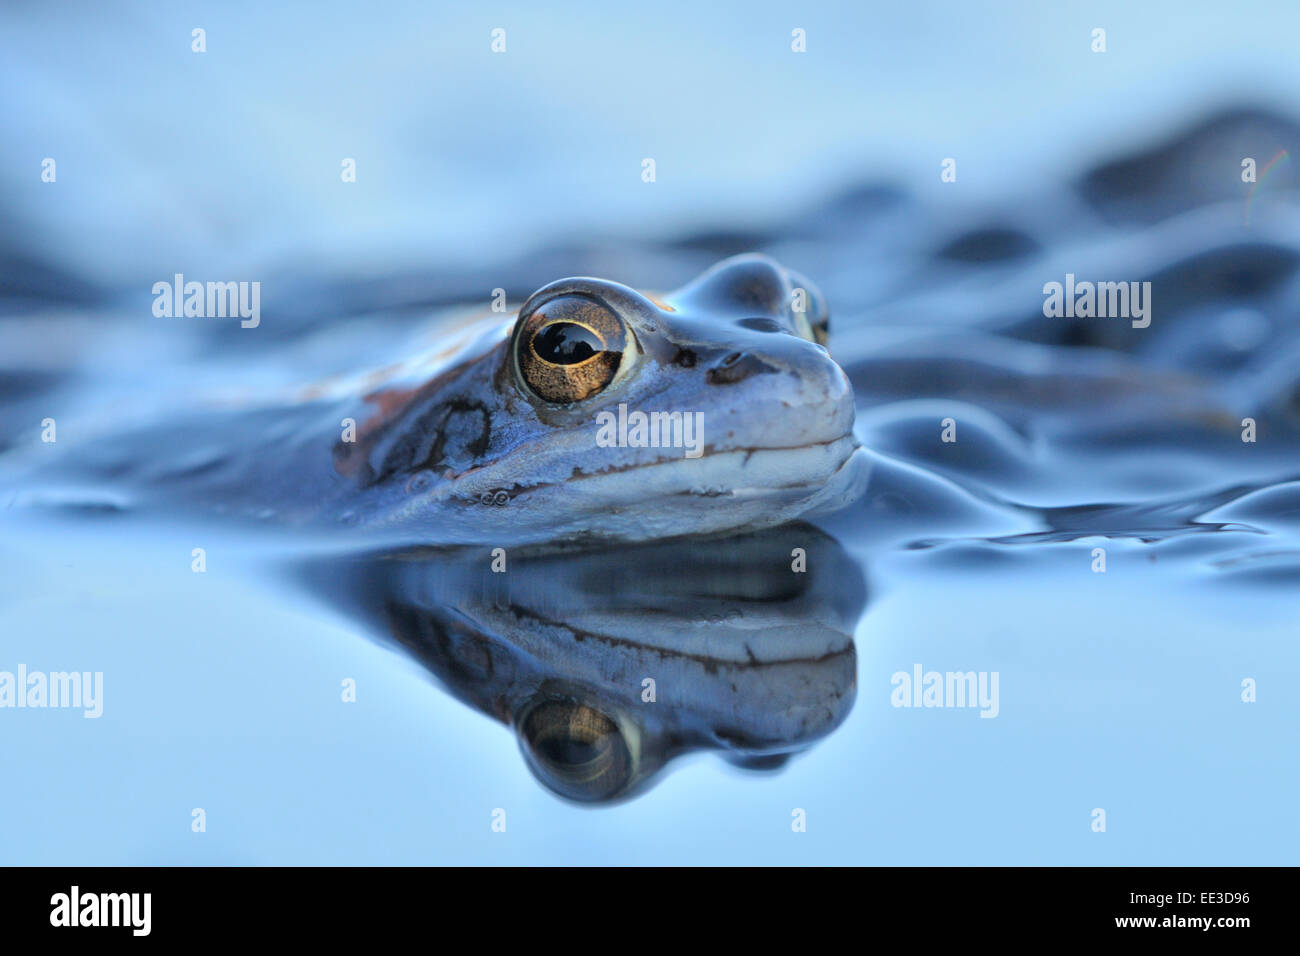 moor frog [Rana arvalis] Moorfrosch germany - Stock Image